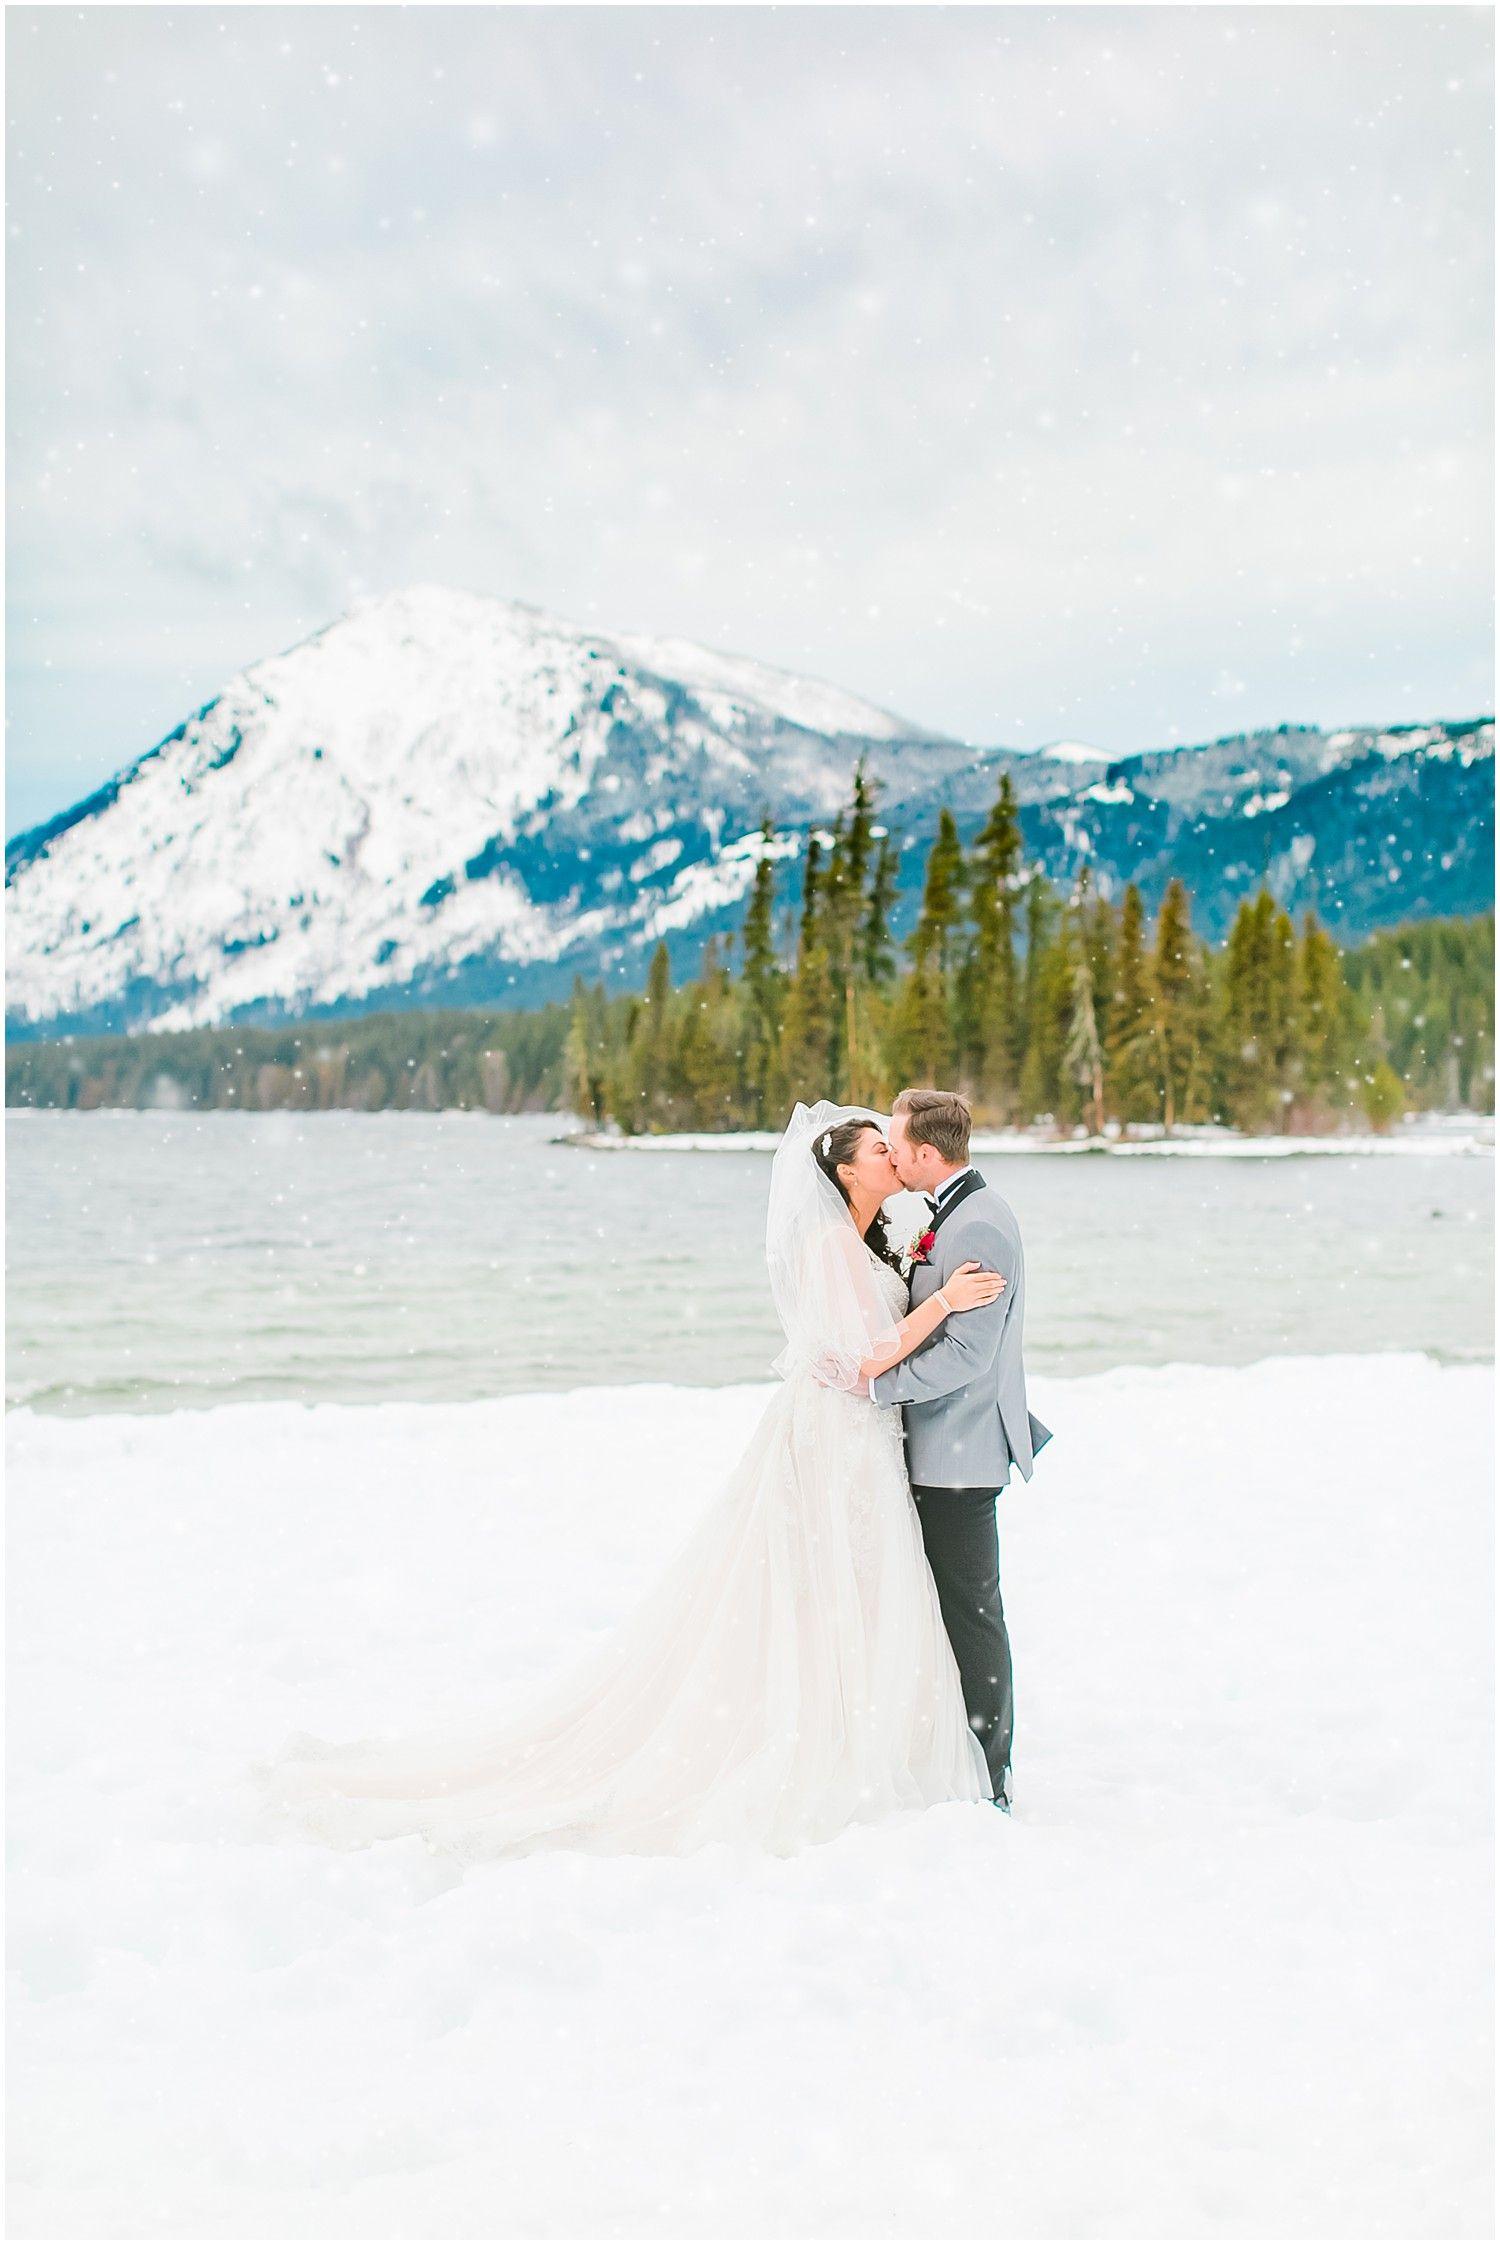 Jake Allysa's Winter Mountain Springs Lodge Wedding Snowy: Winter Wedding Venue Leavenworth At Websimilar.org